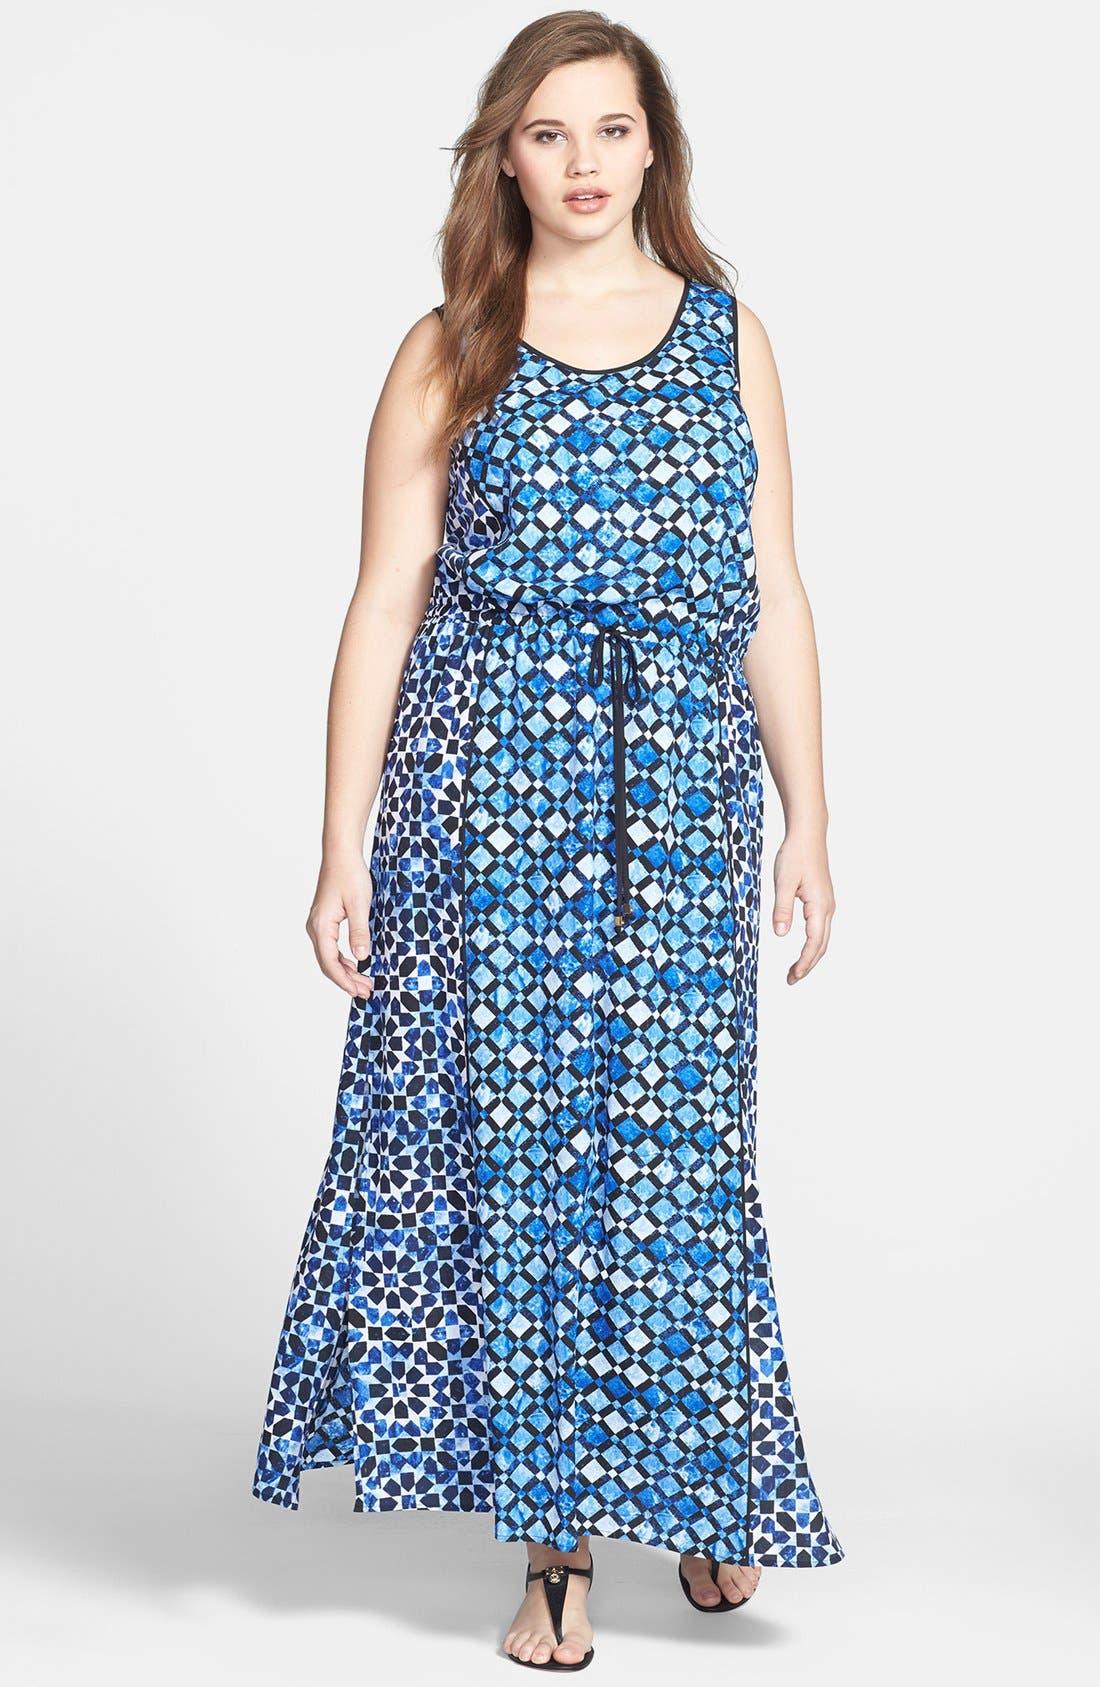 Alternate Image 1 Selected - MICHAEL Michael Kors Print Maxi Dress (Plus Size)